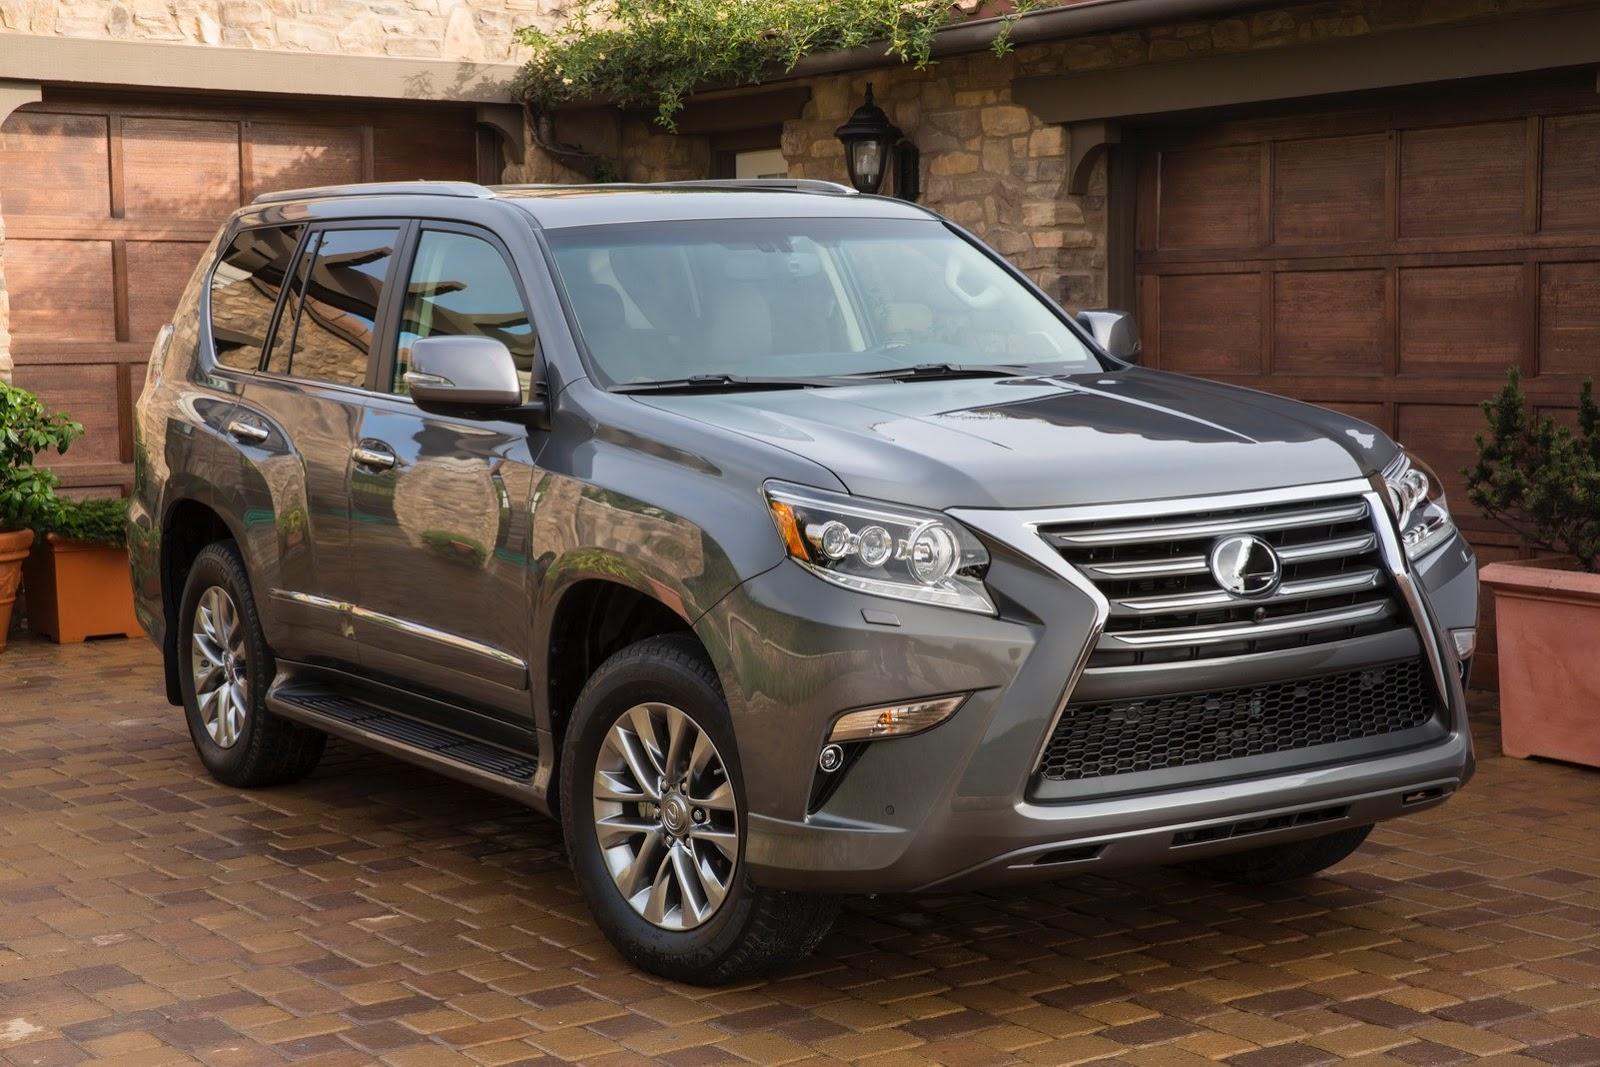 2009/13 - [Toyota/Lexus] Land Cruiser / GX Restylés - Page 4 2014-Lexus-GX-Facelift-4%252524%25255B2%25255D